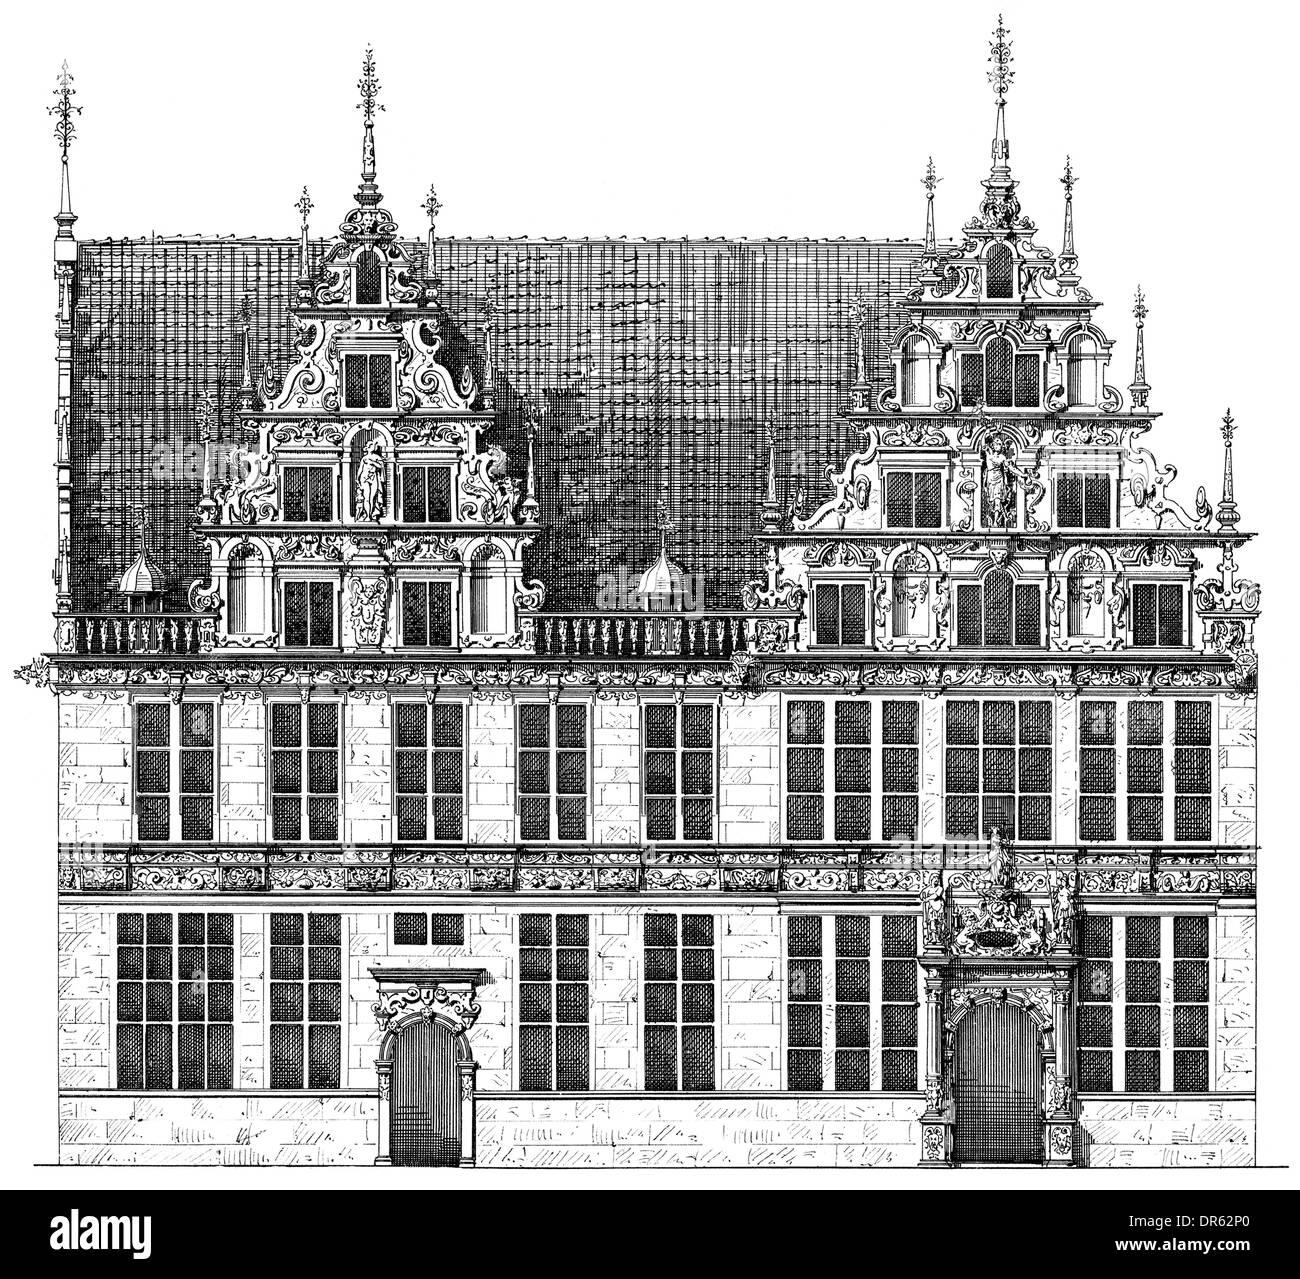 German Renaissance Style 17th Century Gewerbehaus Building In Bremen Germany